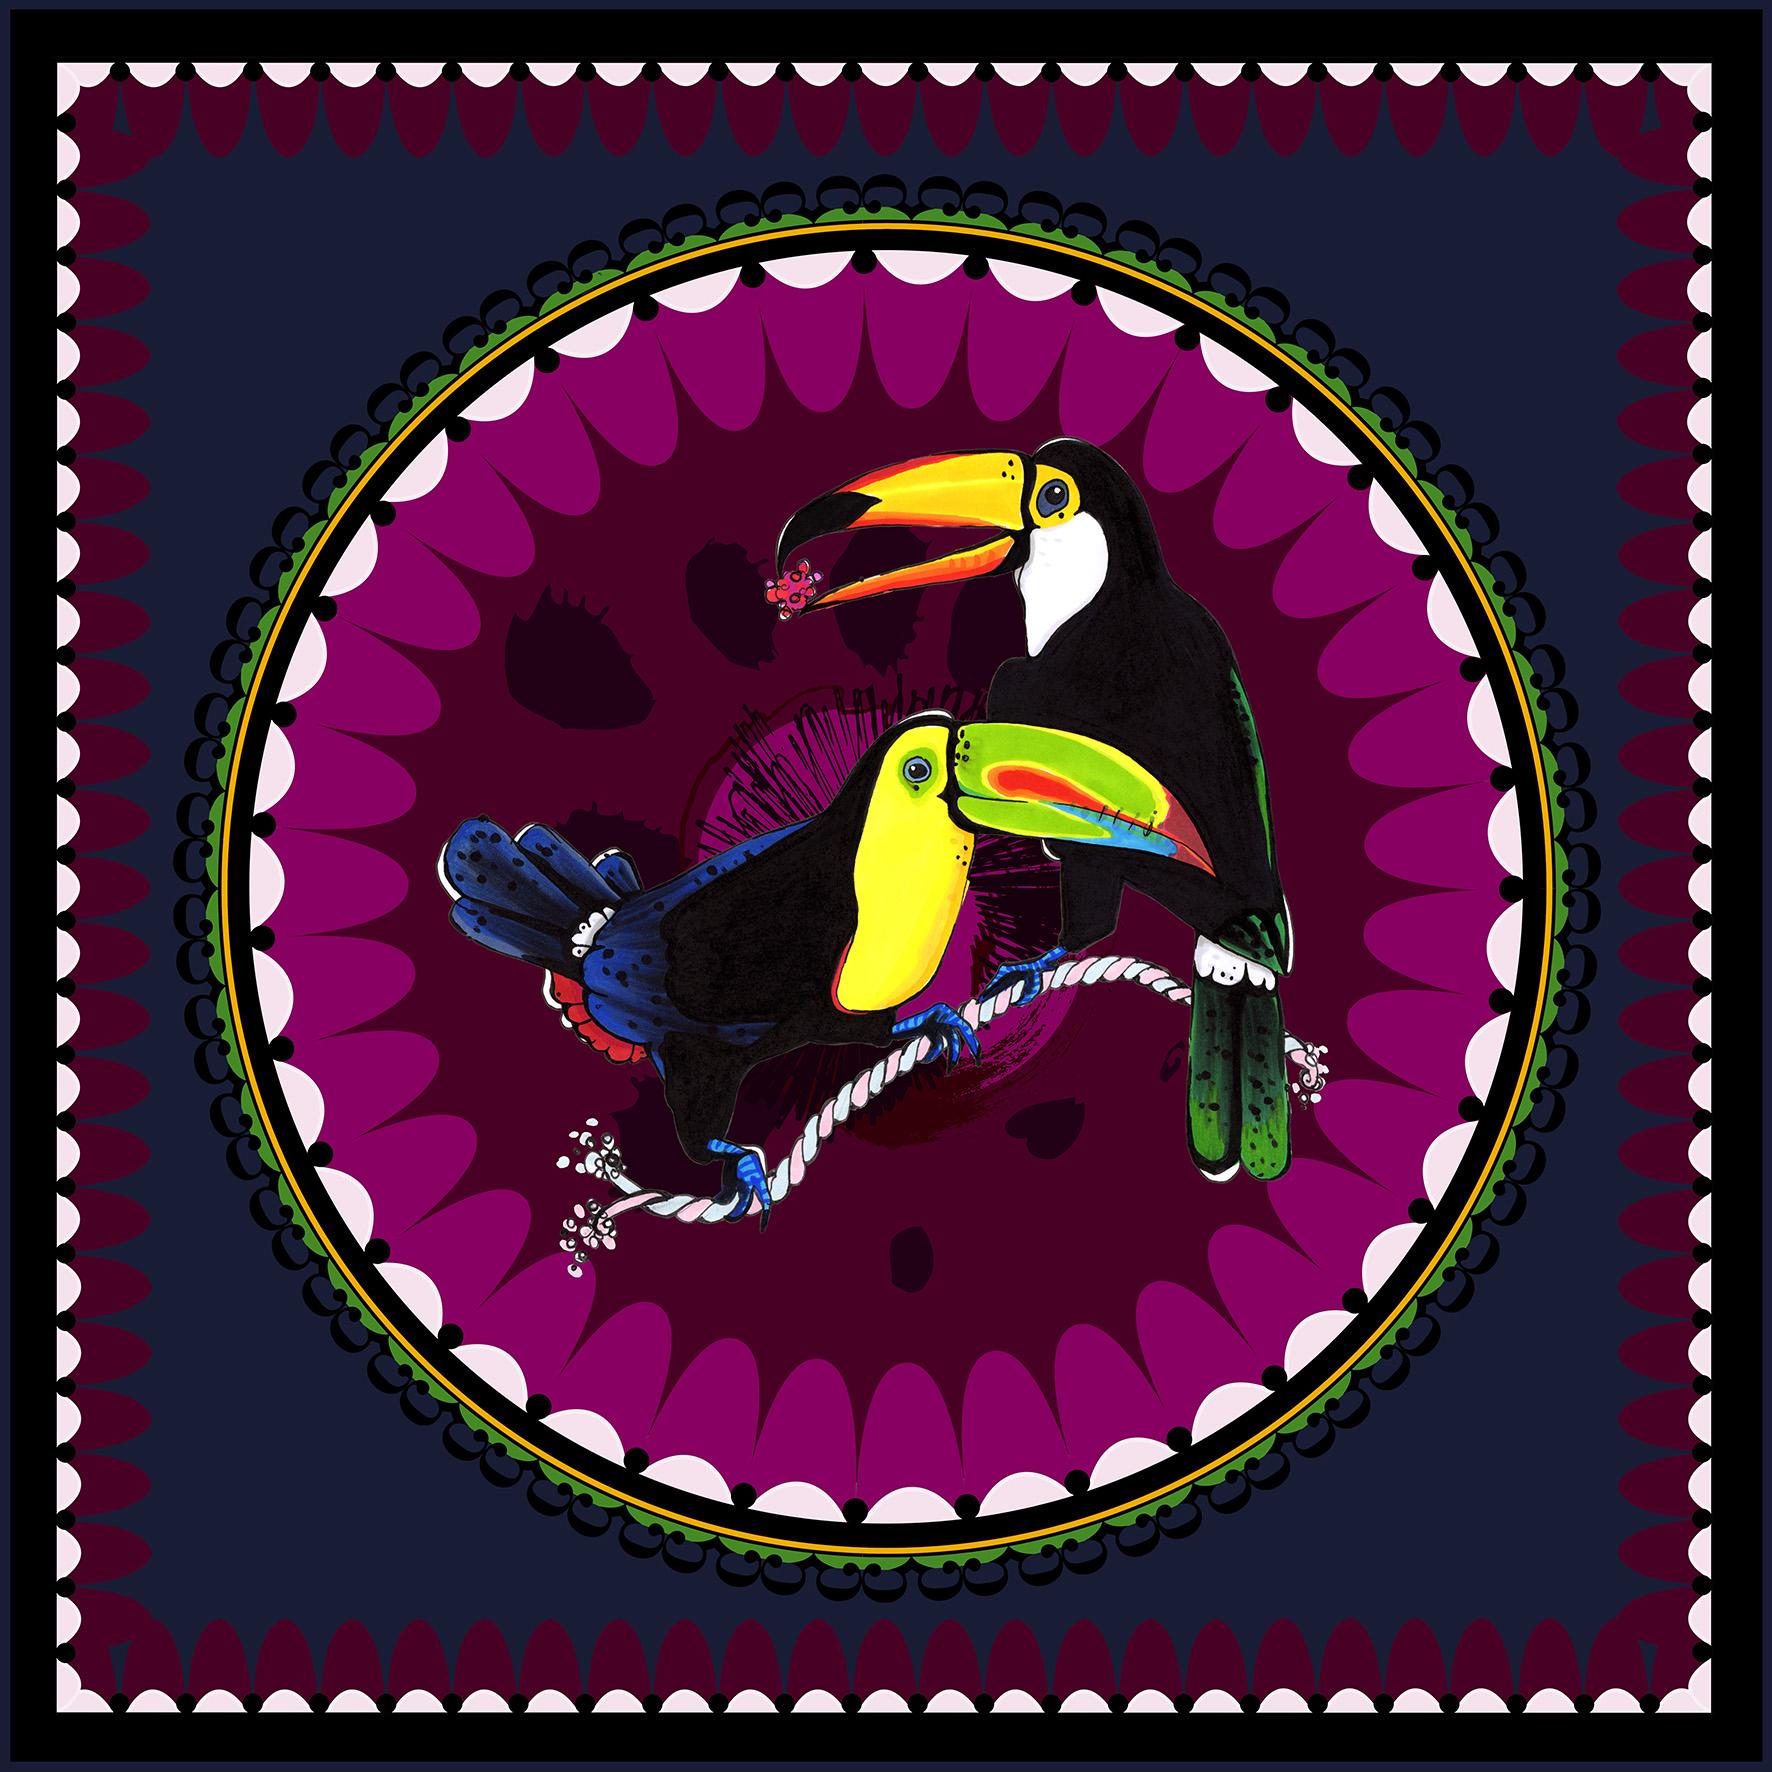 aase hopstock bold vibrant illustration silk scarf